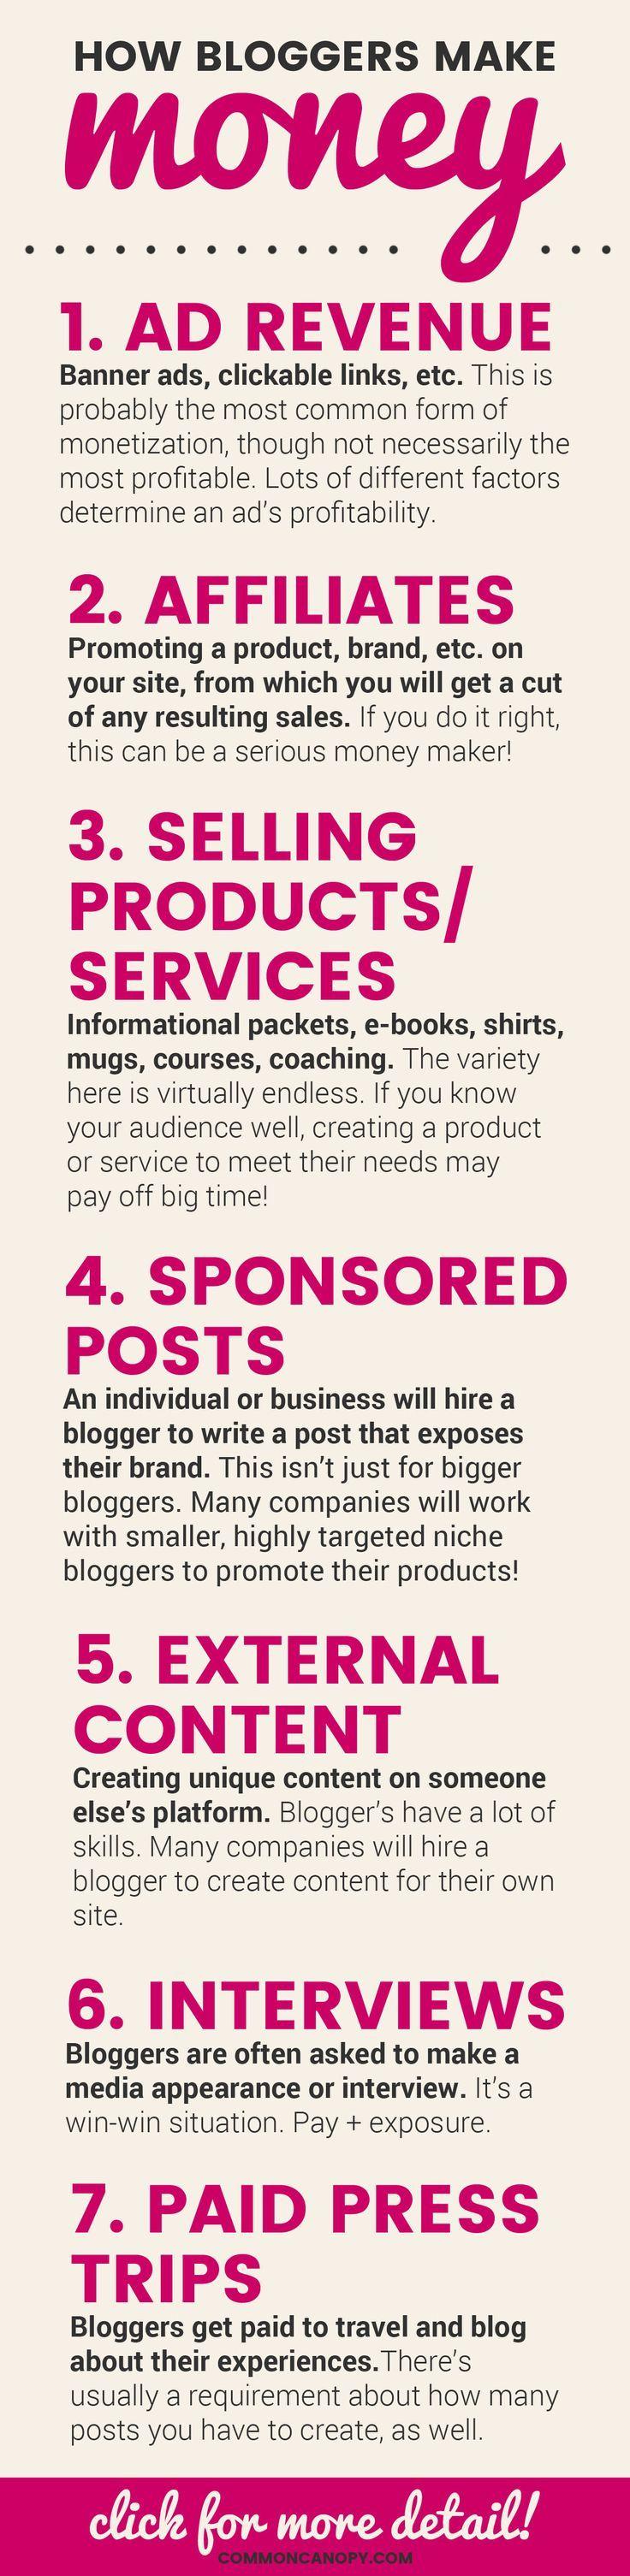 7 Ways Bloggers Continually Make Money – Brandstorming